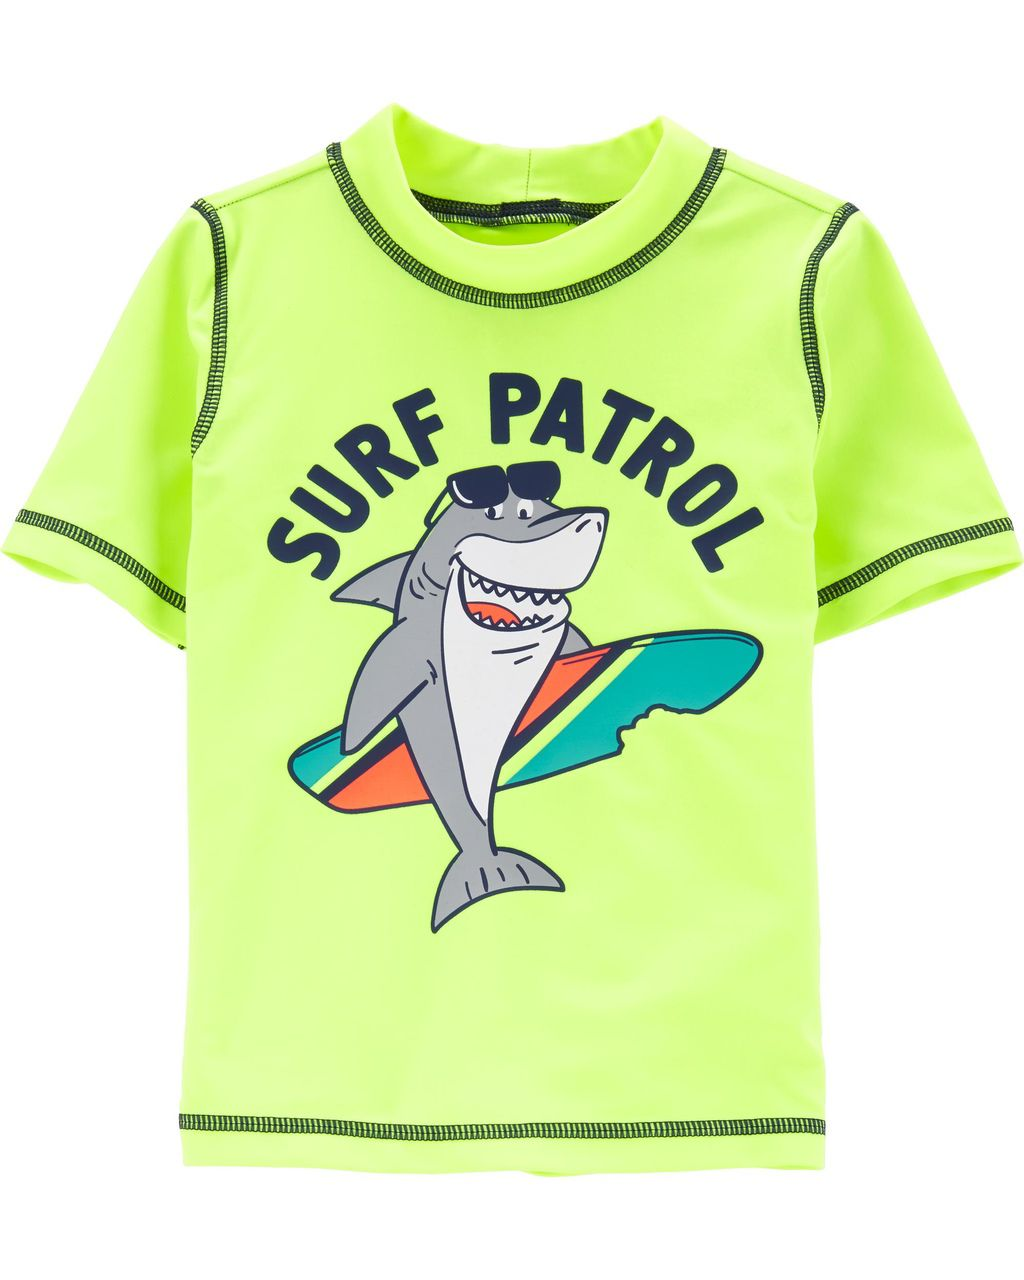 Camiseta Praia Carter's Surf Patrol